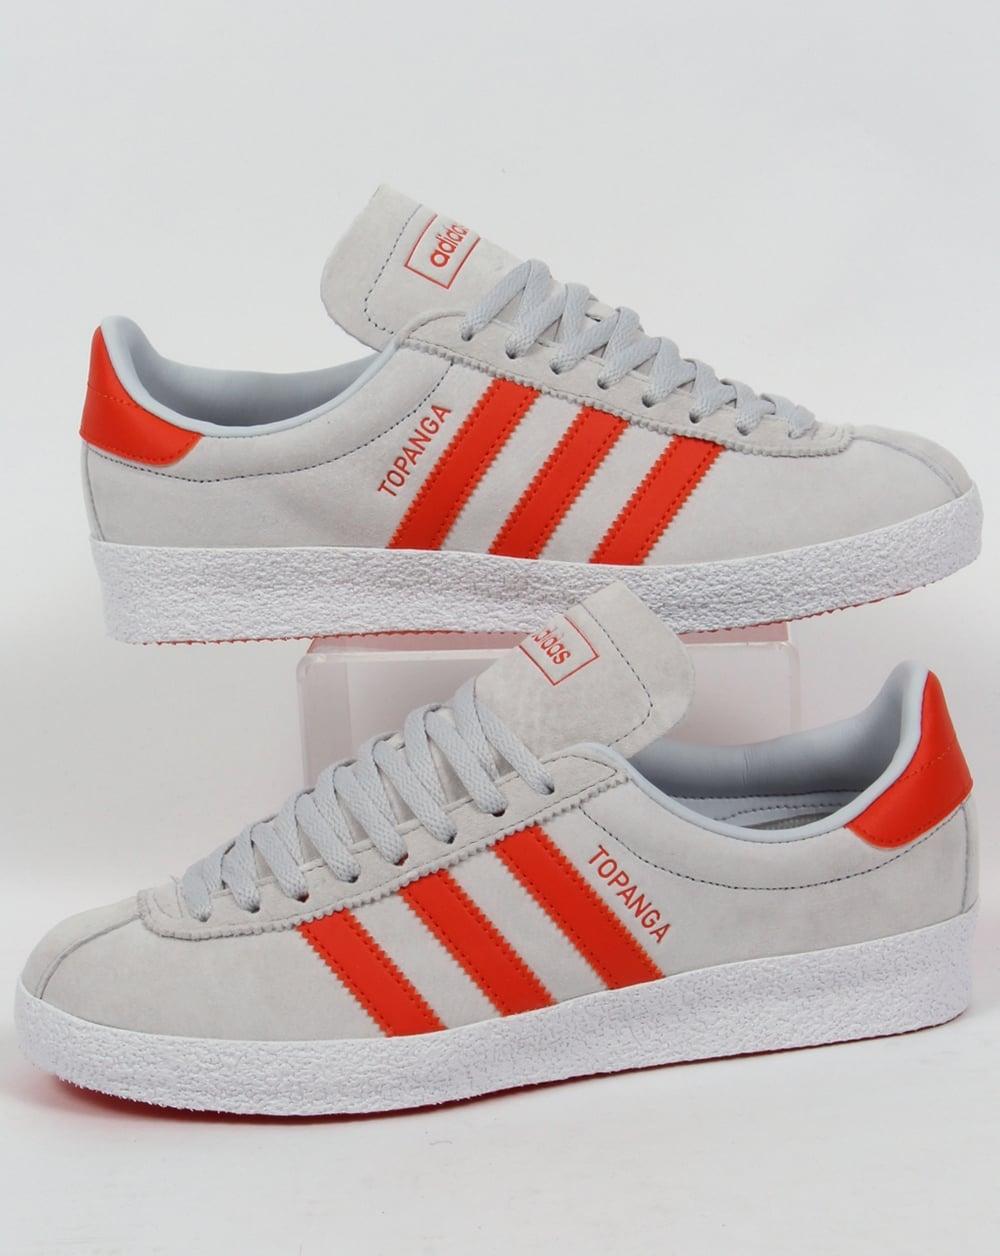 Adidas Topanga Trainers Grey/Orange